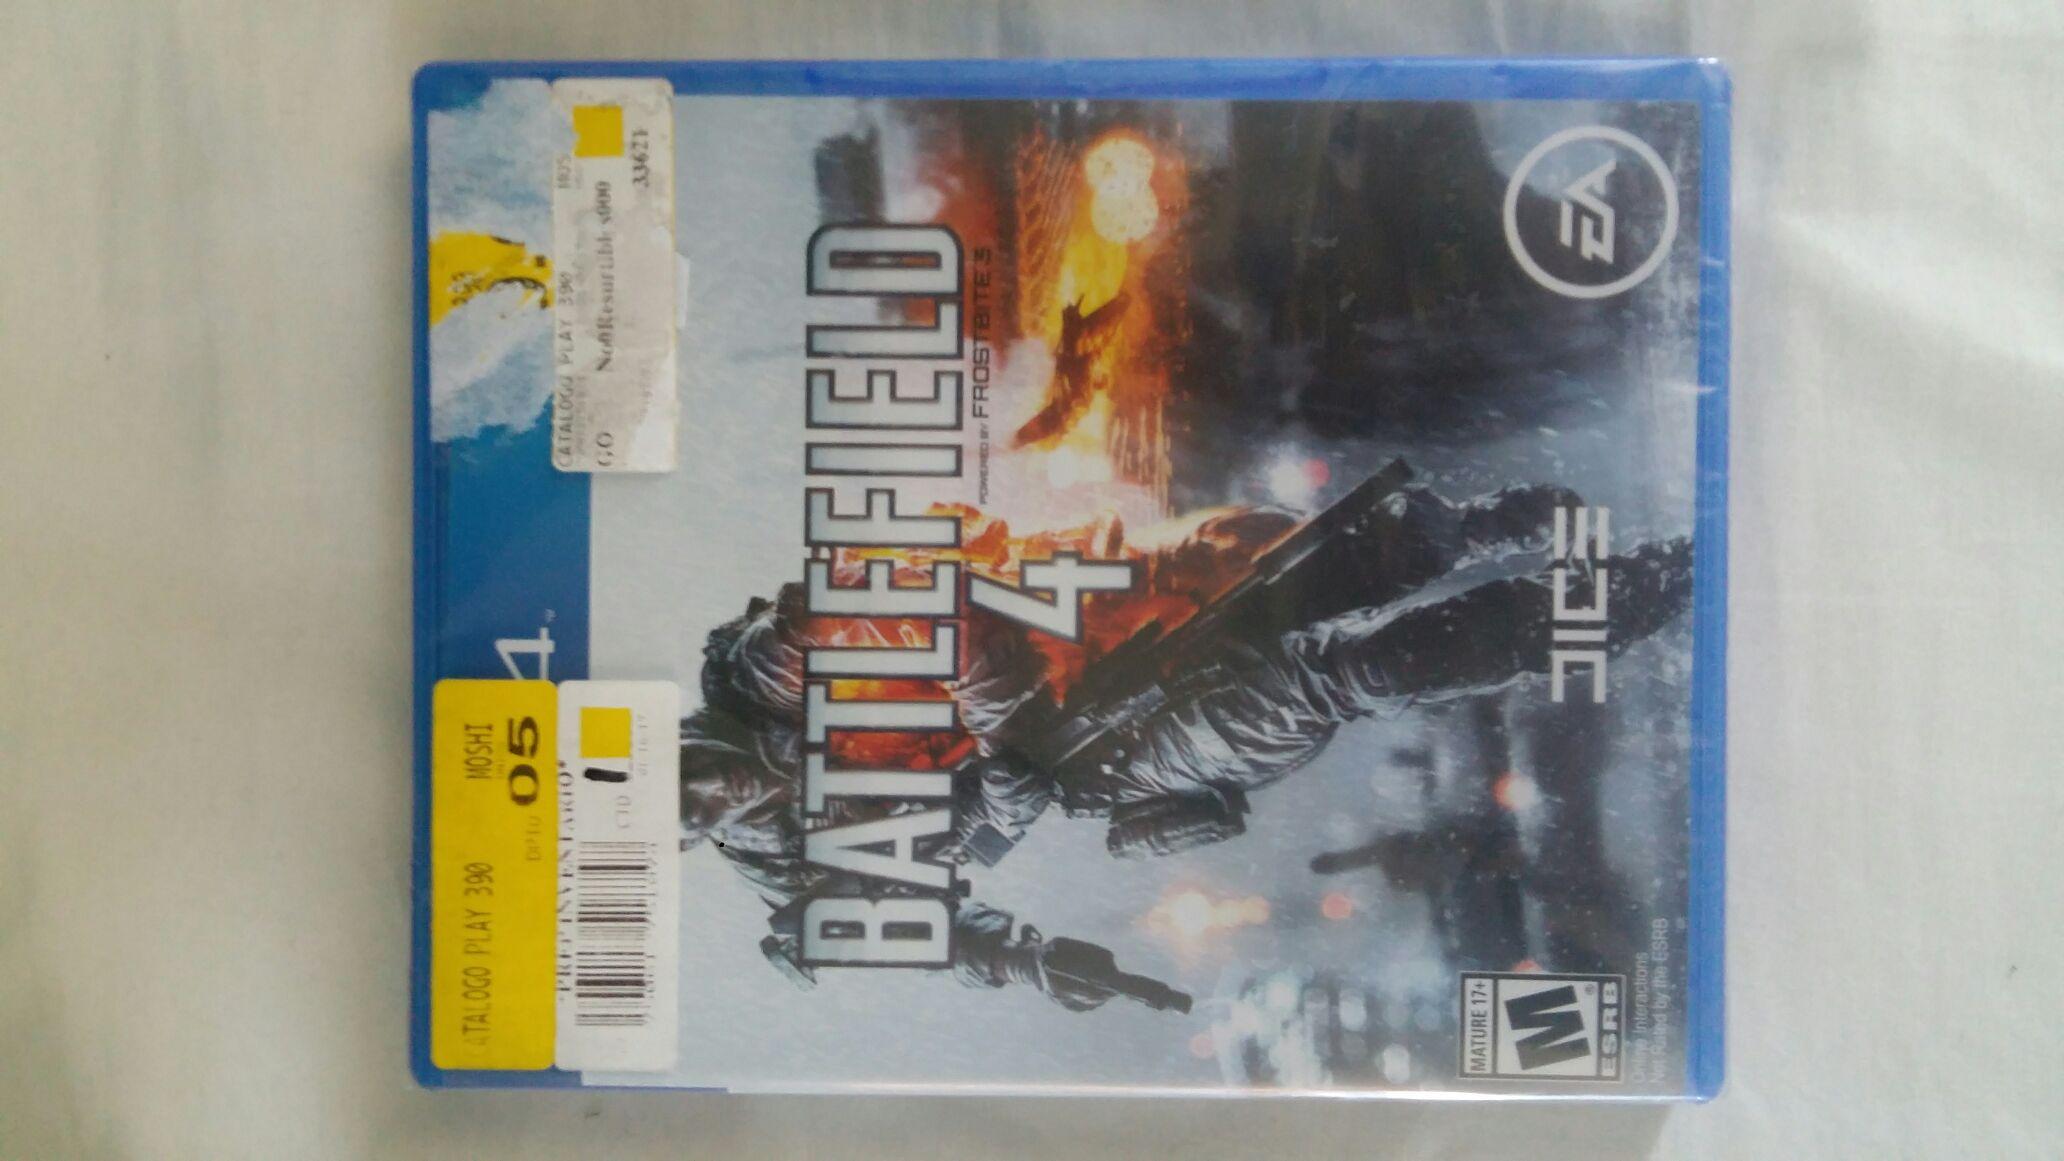 Bodega Aurrerá: Battlefield 4 para PS4